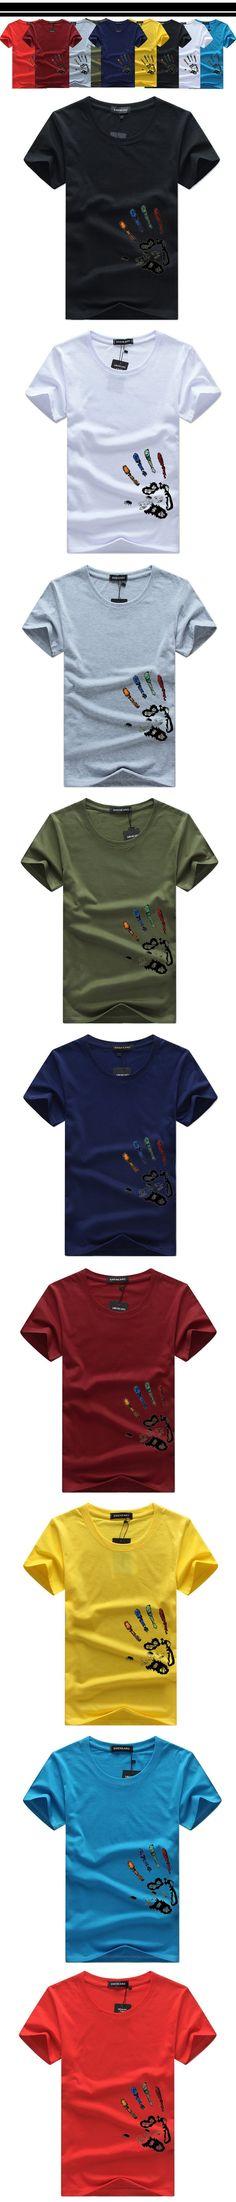 Mens Short Sleeve Cotton Contrast Collar Hoops Ringer Tee T-Shirt Tshirt No Logo